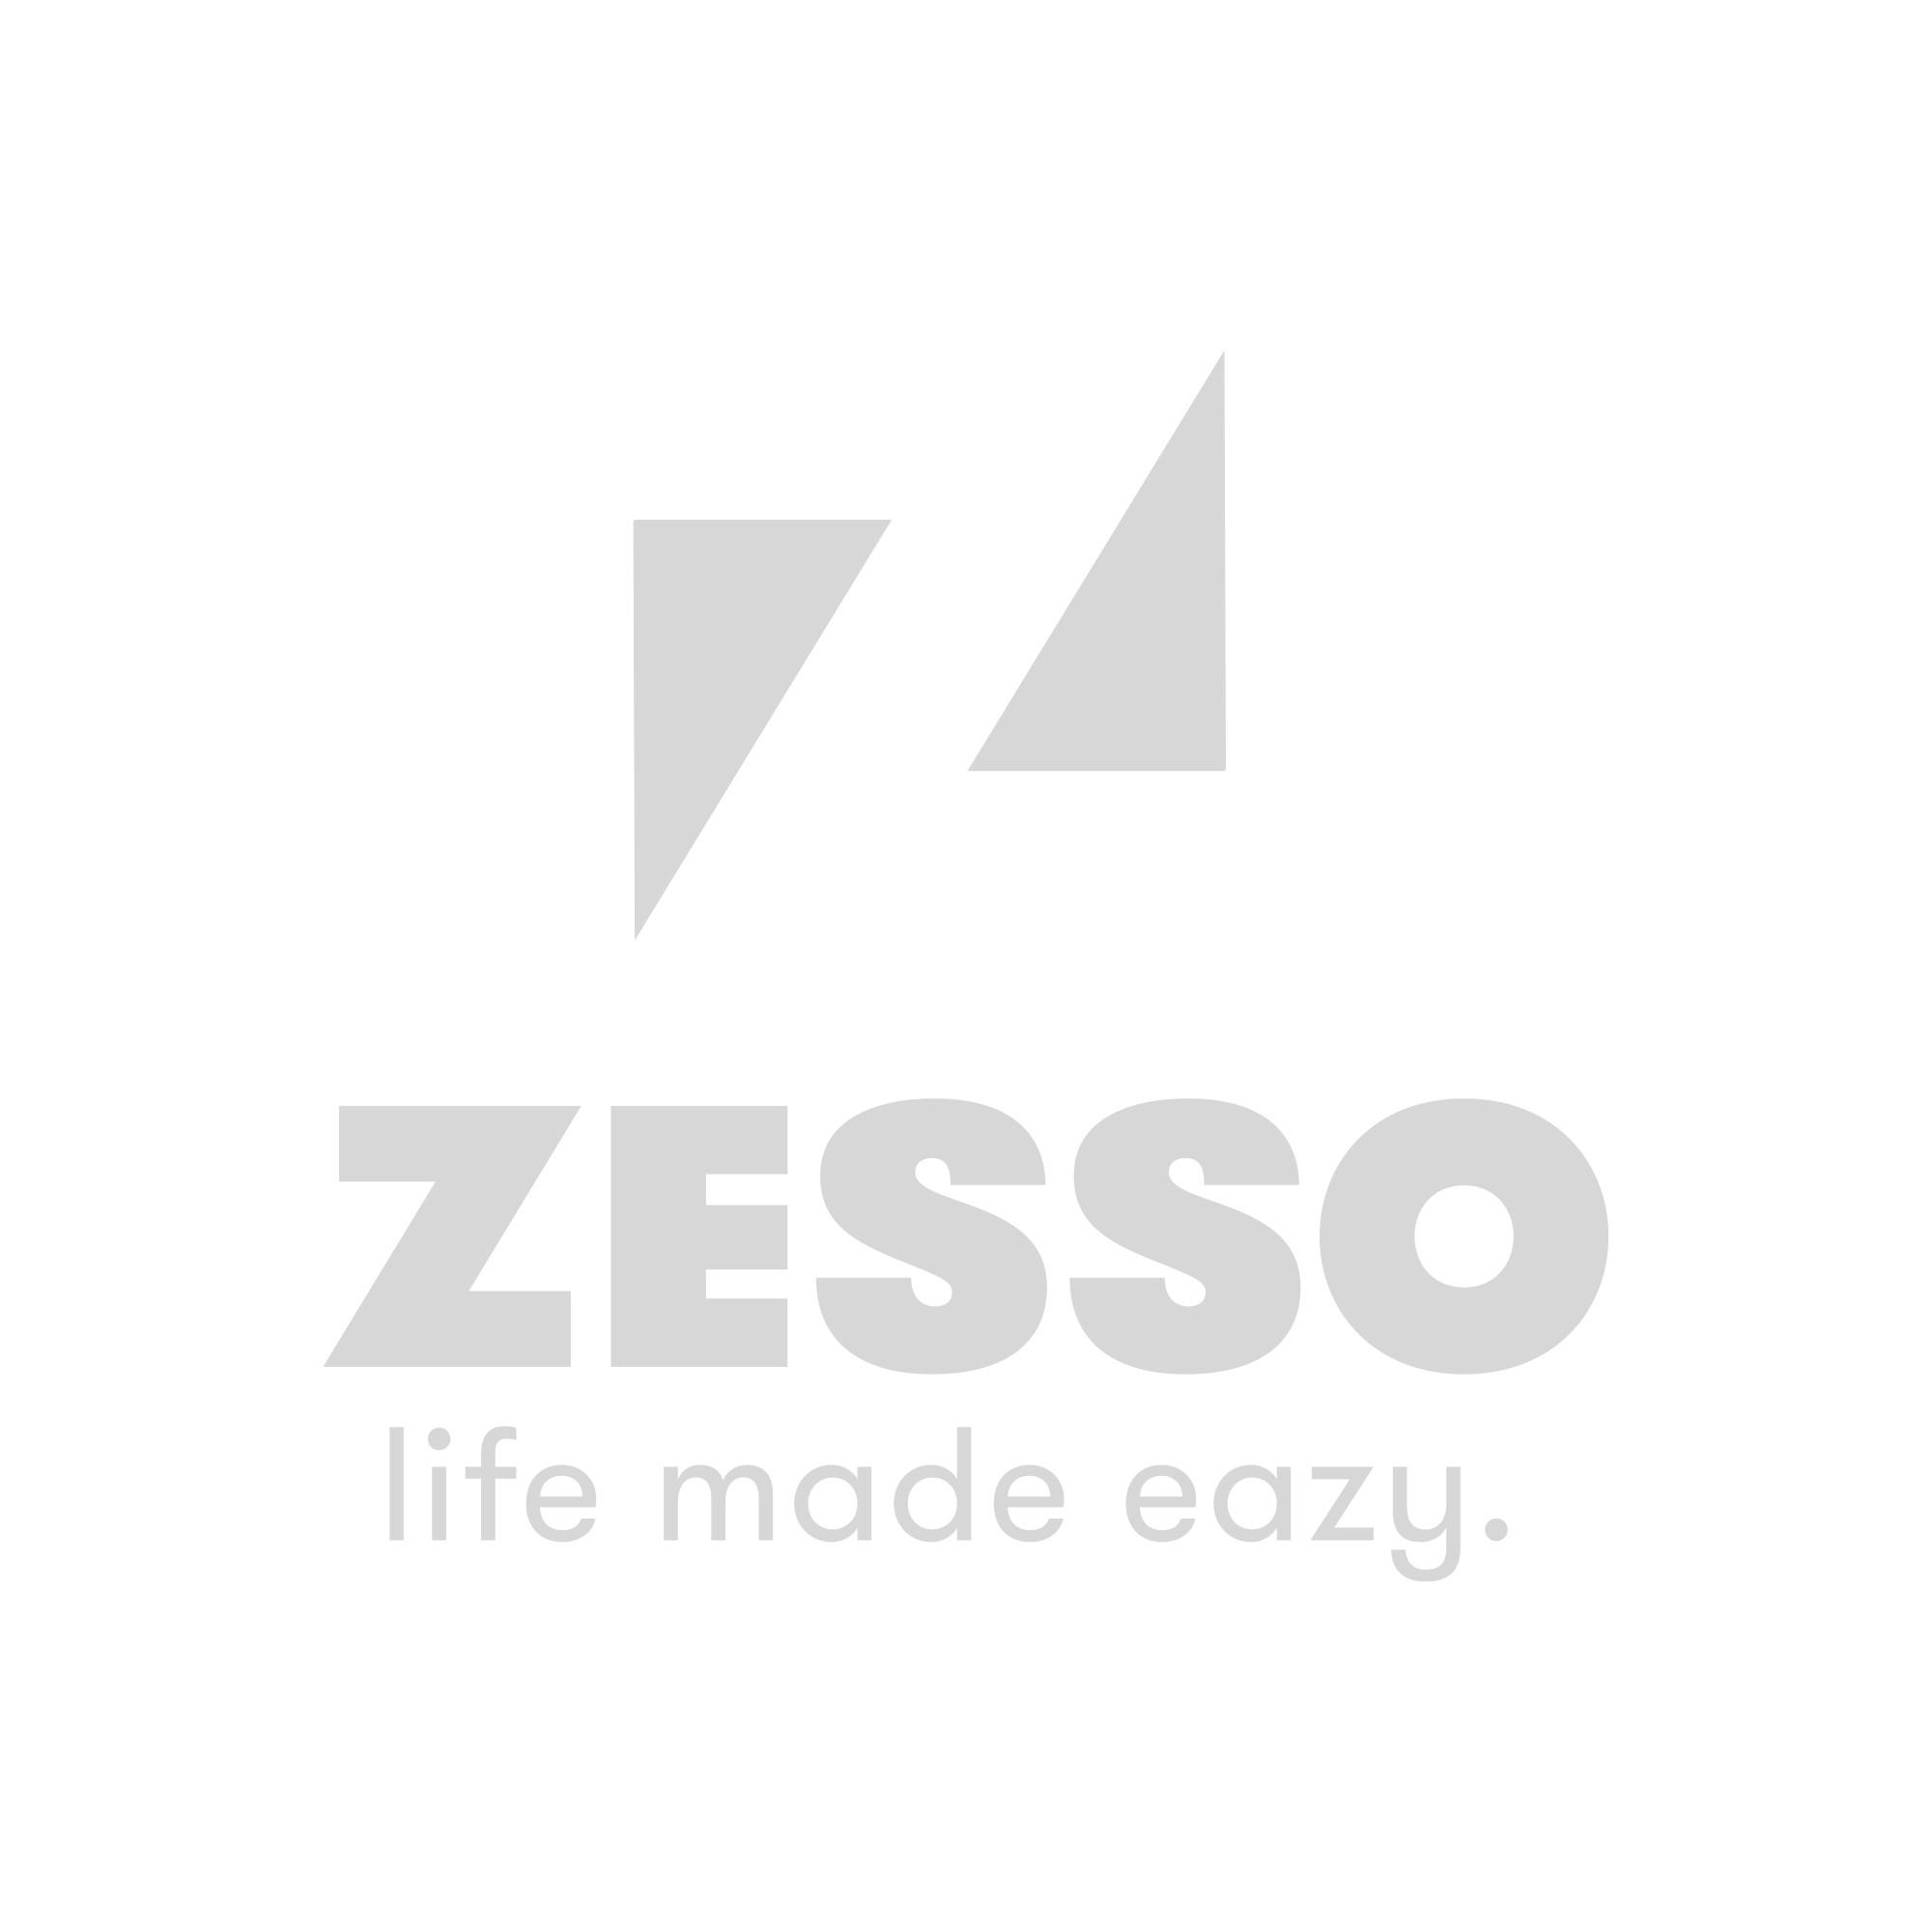 Kleine Wolke Douchegordijn 180 x 200 cm Bubble